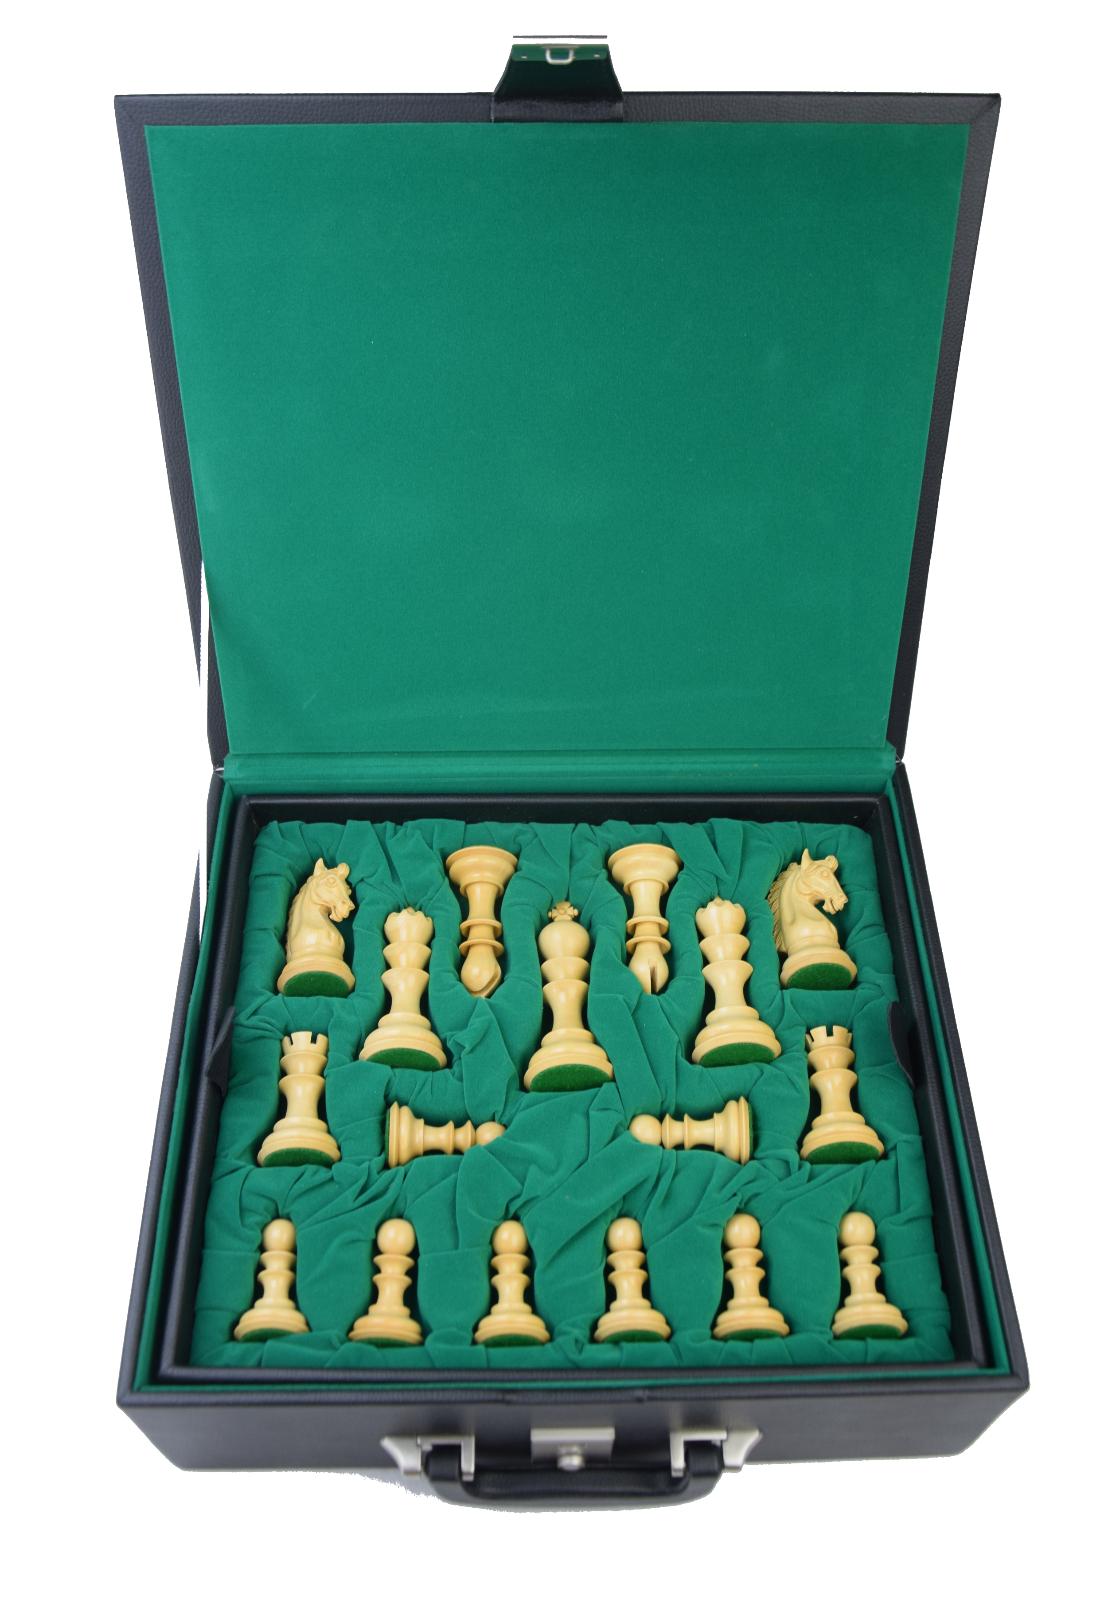 ROOGU Roman Empire Magnificient XL Chess Figures Set Million Dollar Dollar Dollar Case KH4.7'' 51ea18